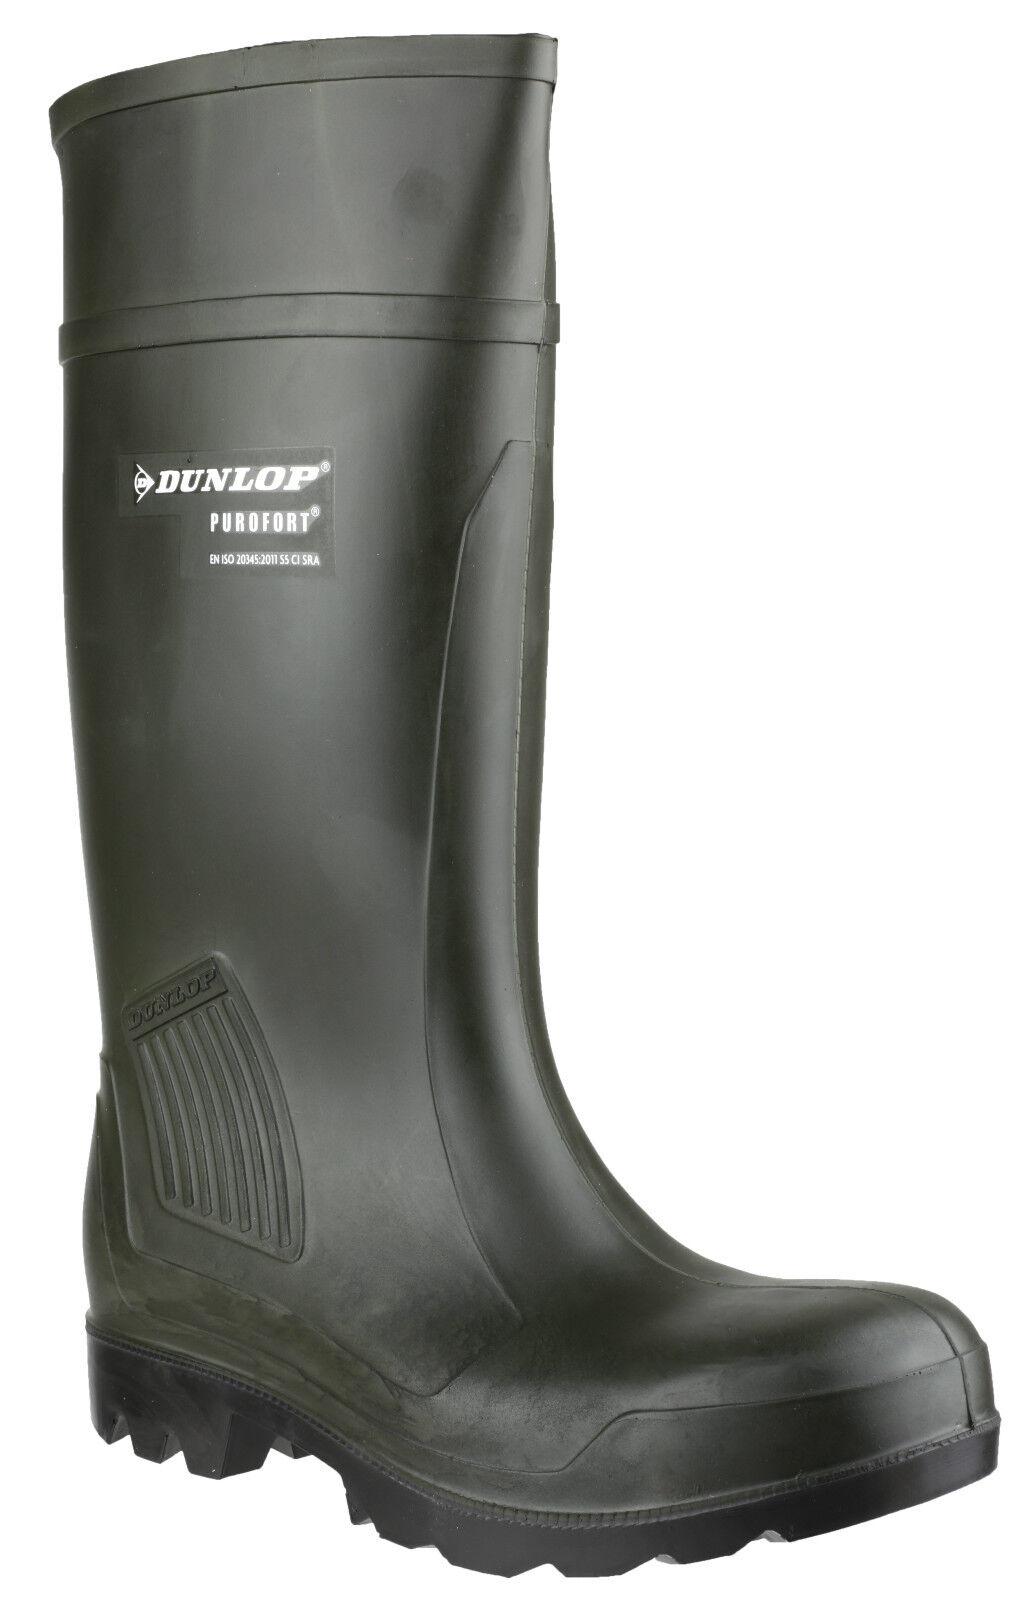 Dunlop Purofort Sicurezza Unisex Impermeabile uk4-13 Professional Wellington uk4-13 Impermeabile 096785